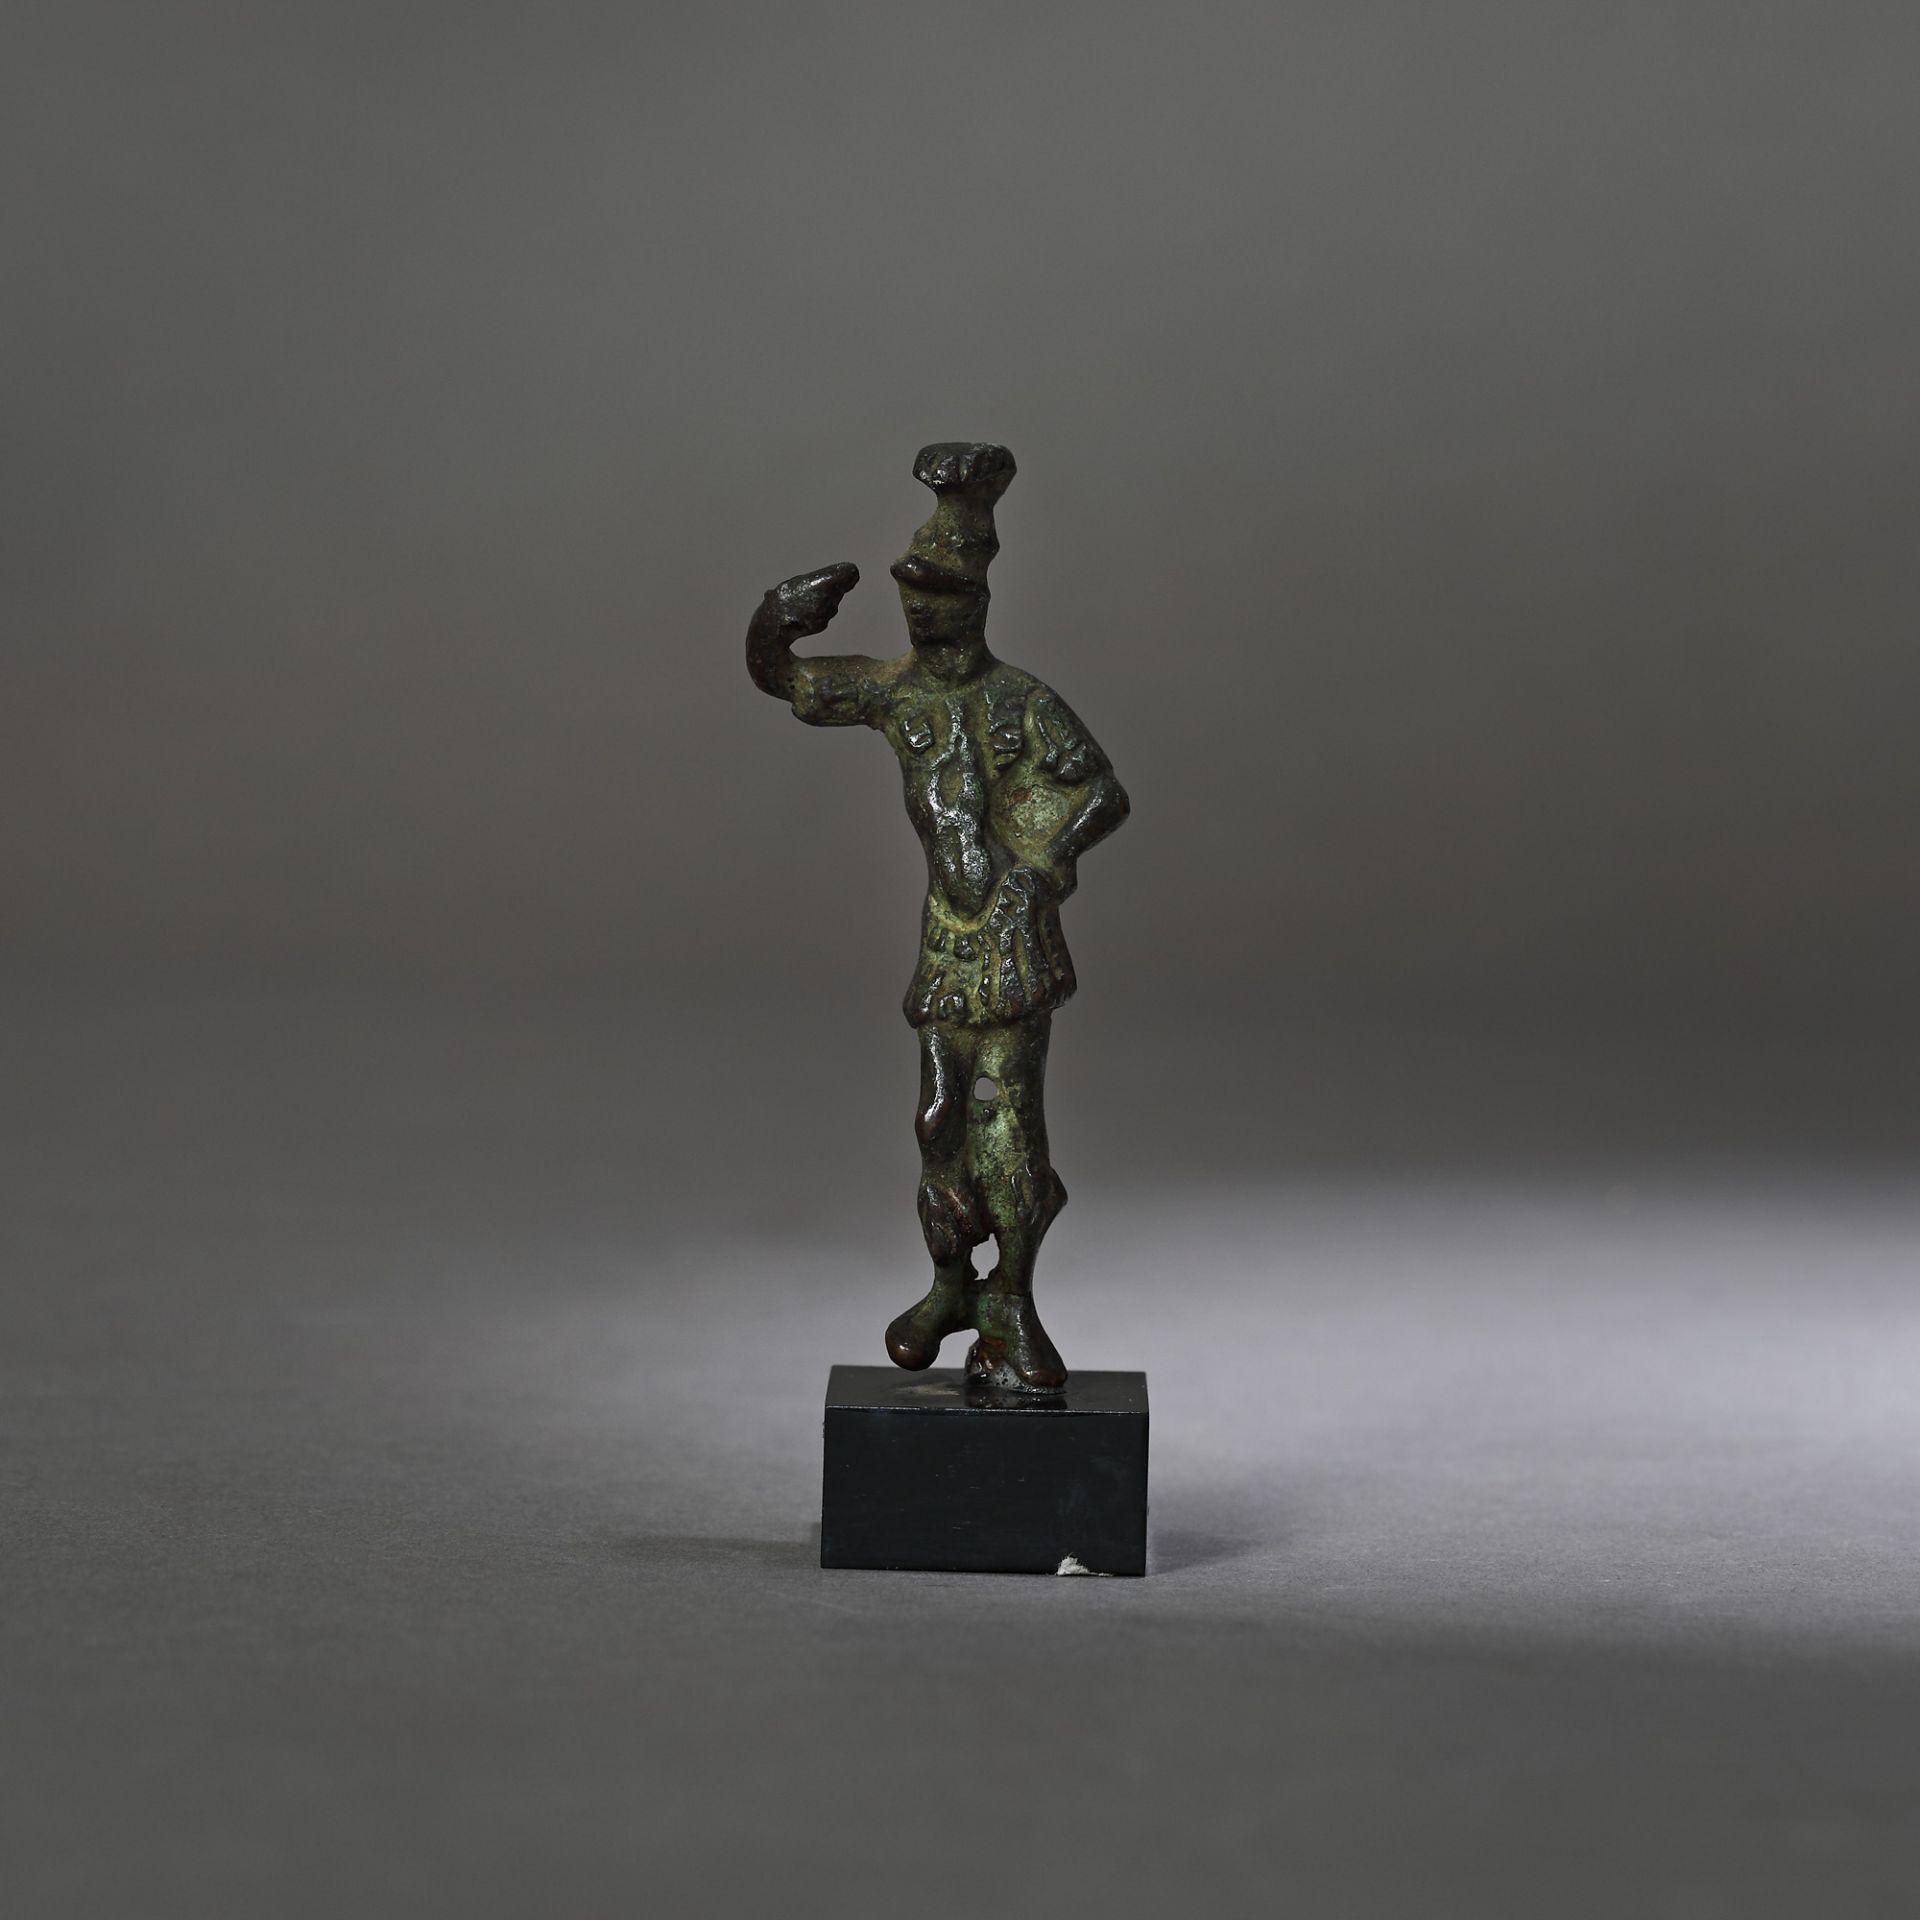 Bronze statuette depicting the god Mars, 2nd-1st century B.C.